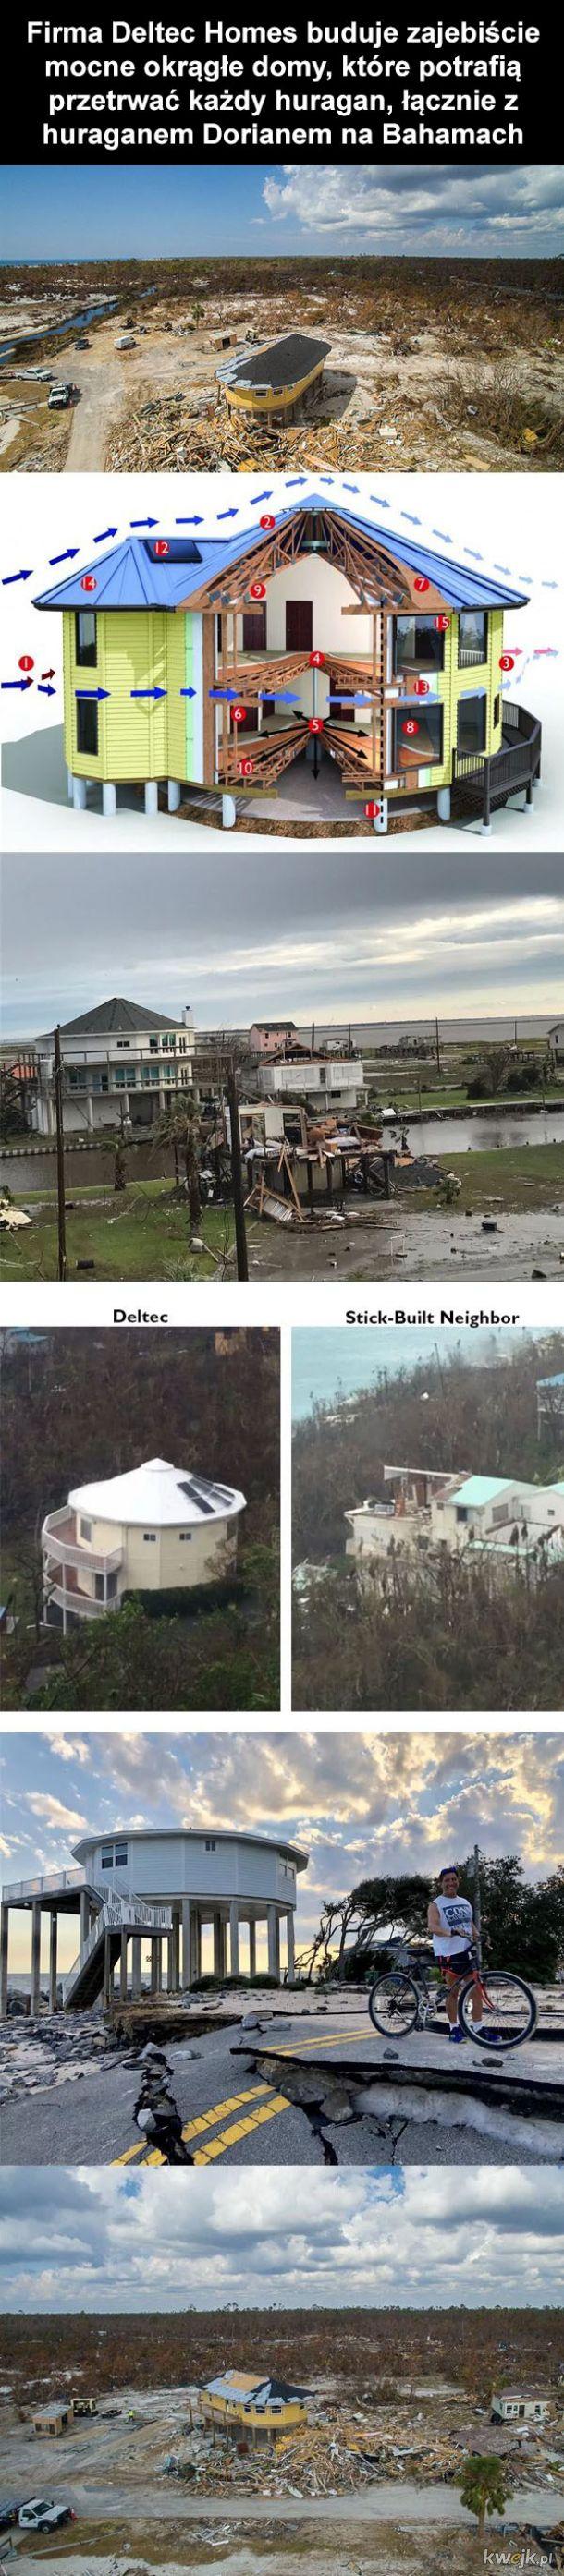 Przeciw huraganom